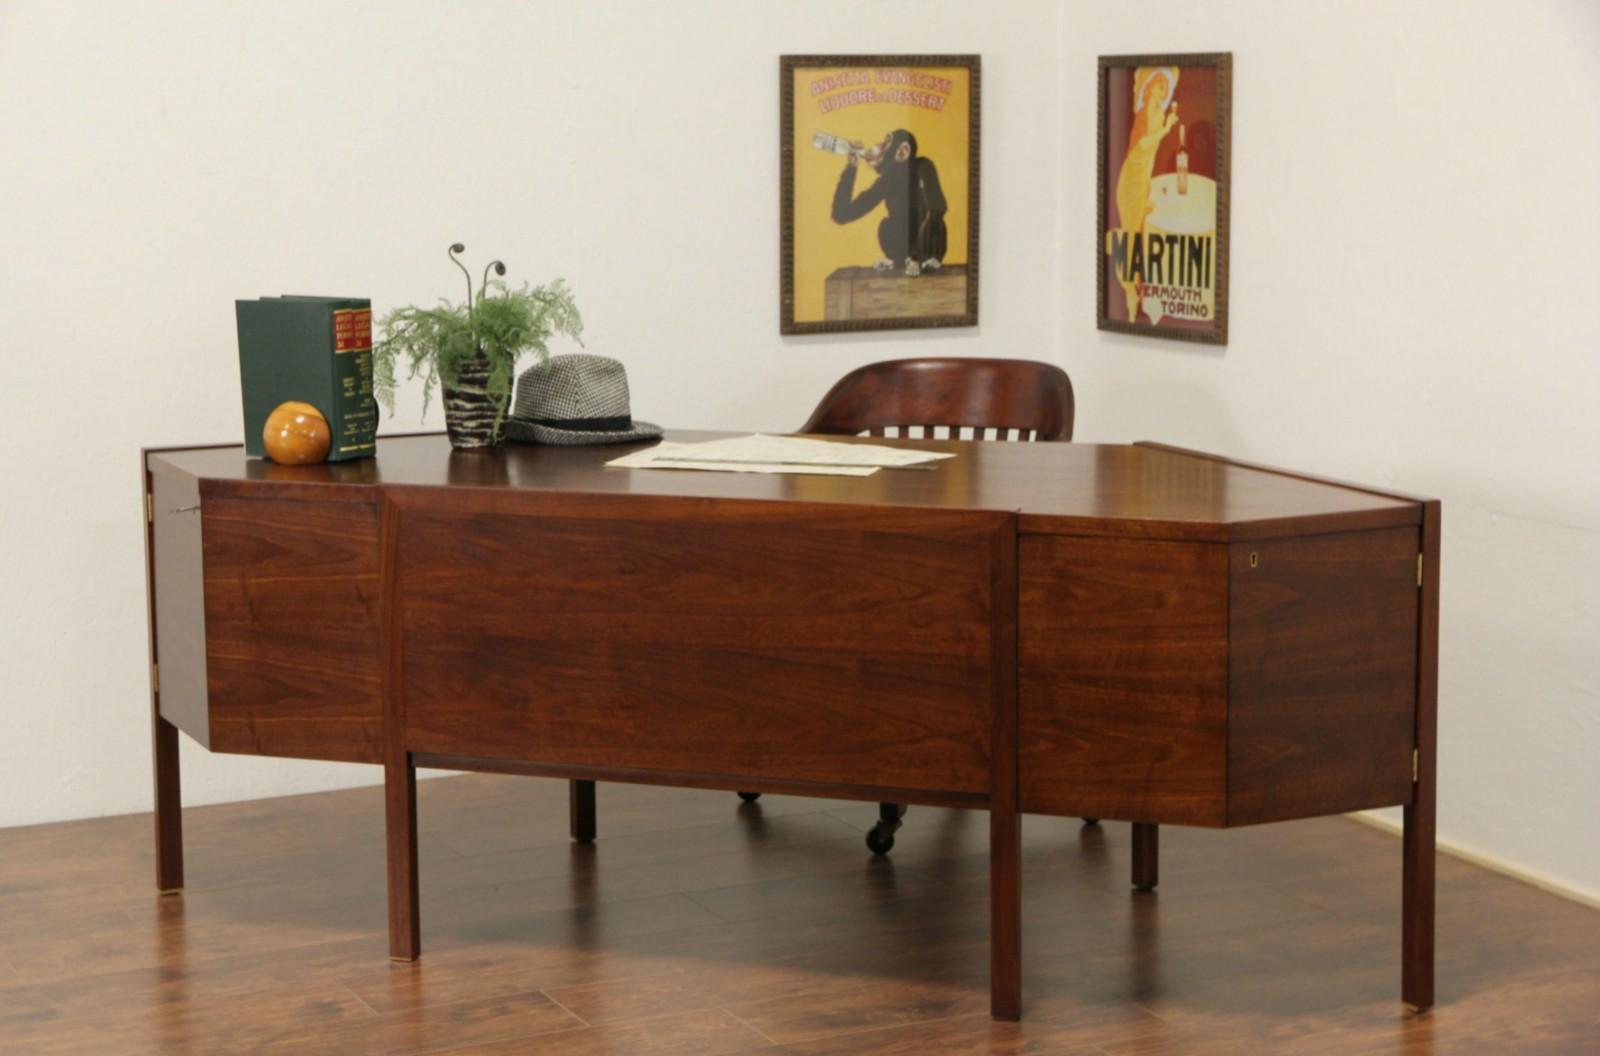 40 Vintage Midcentury Modern Dunbar Executive Walnut Desk, Fits in Corner